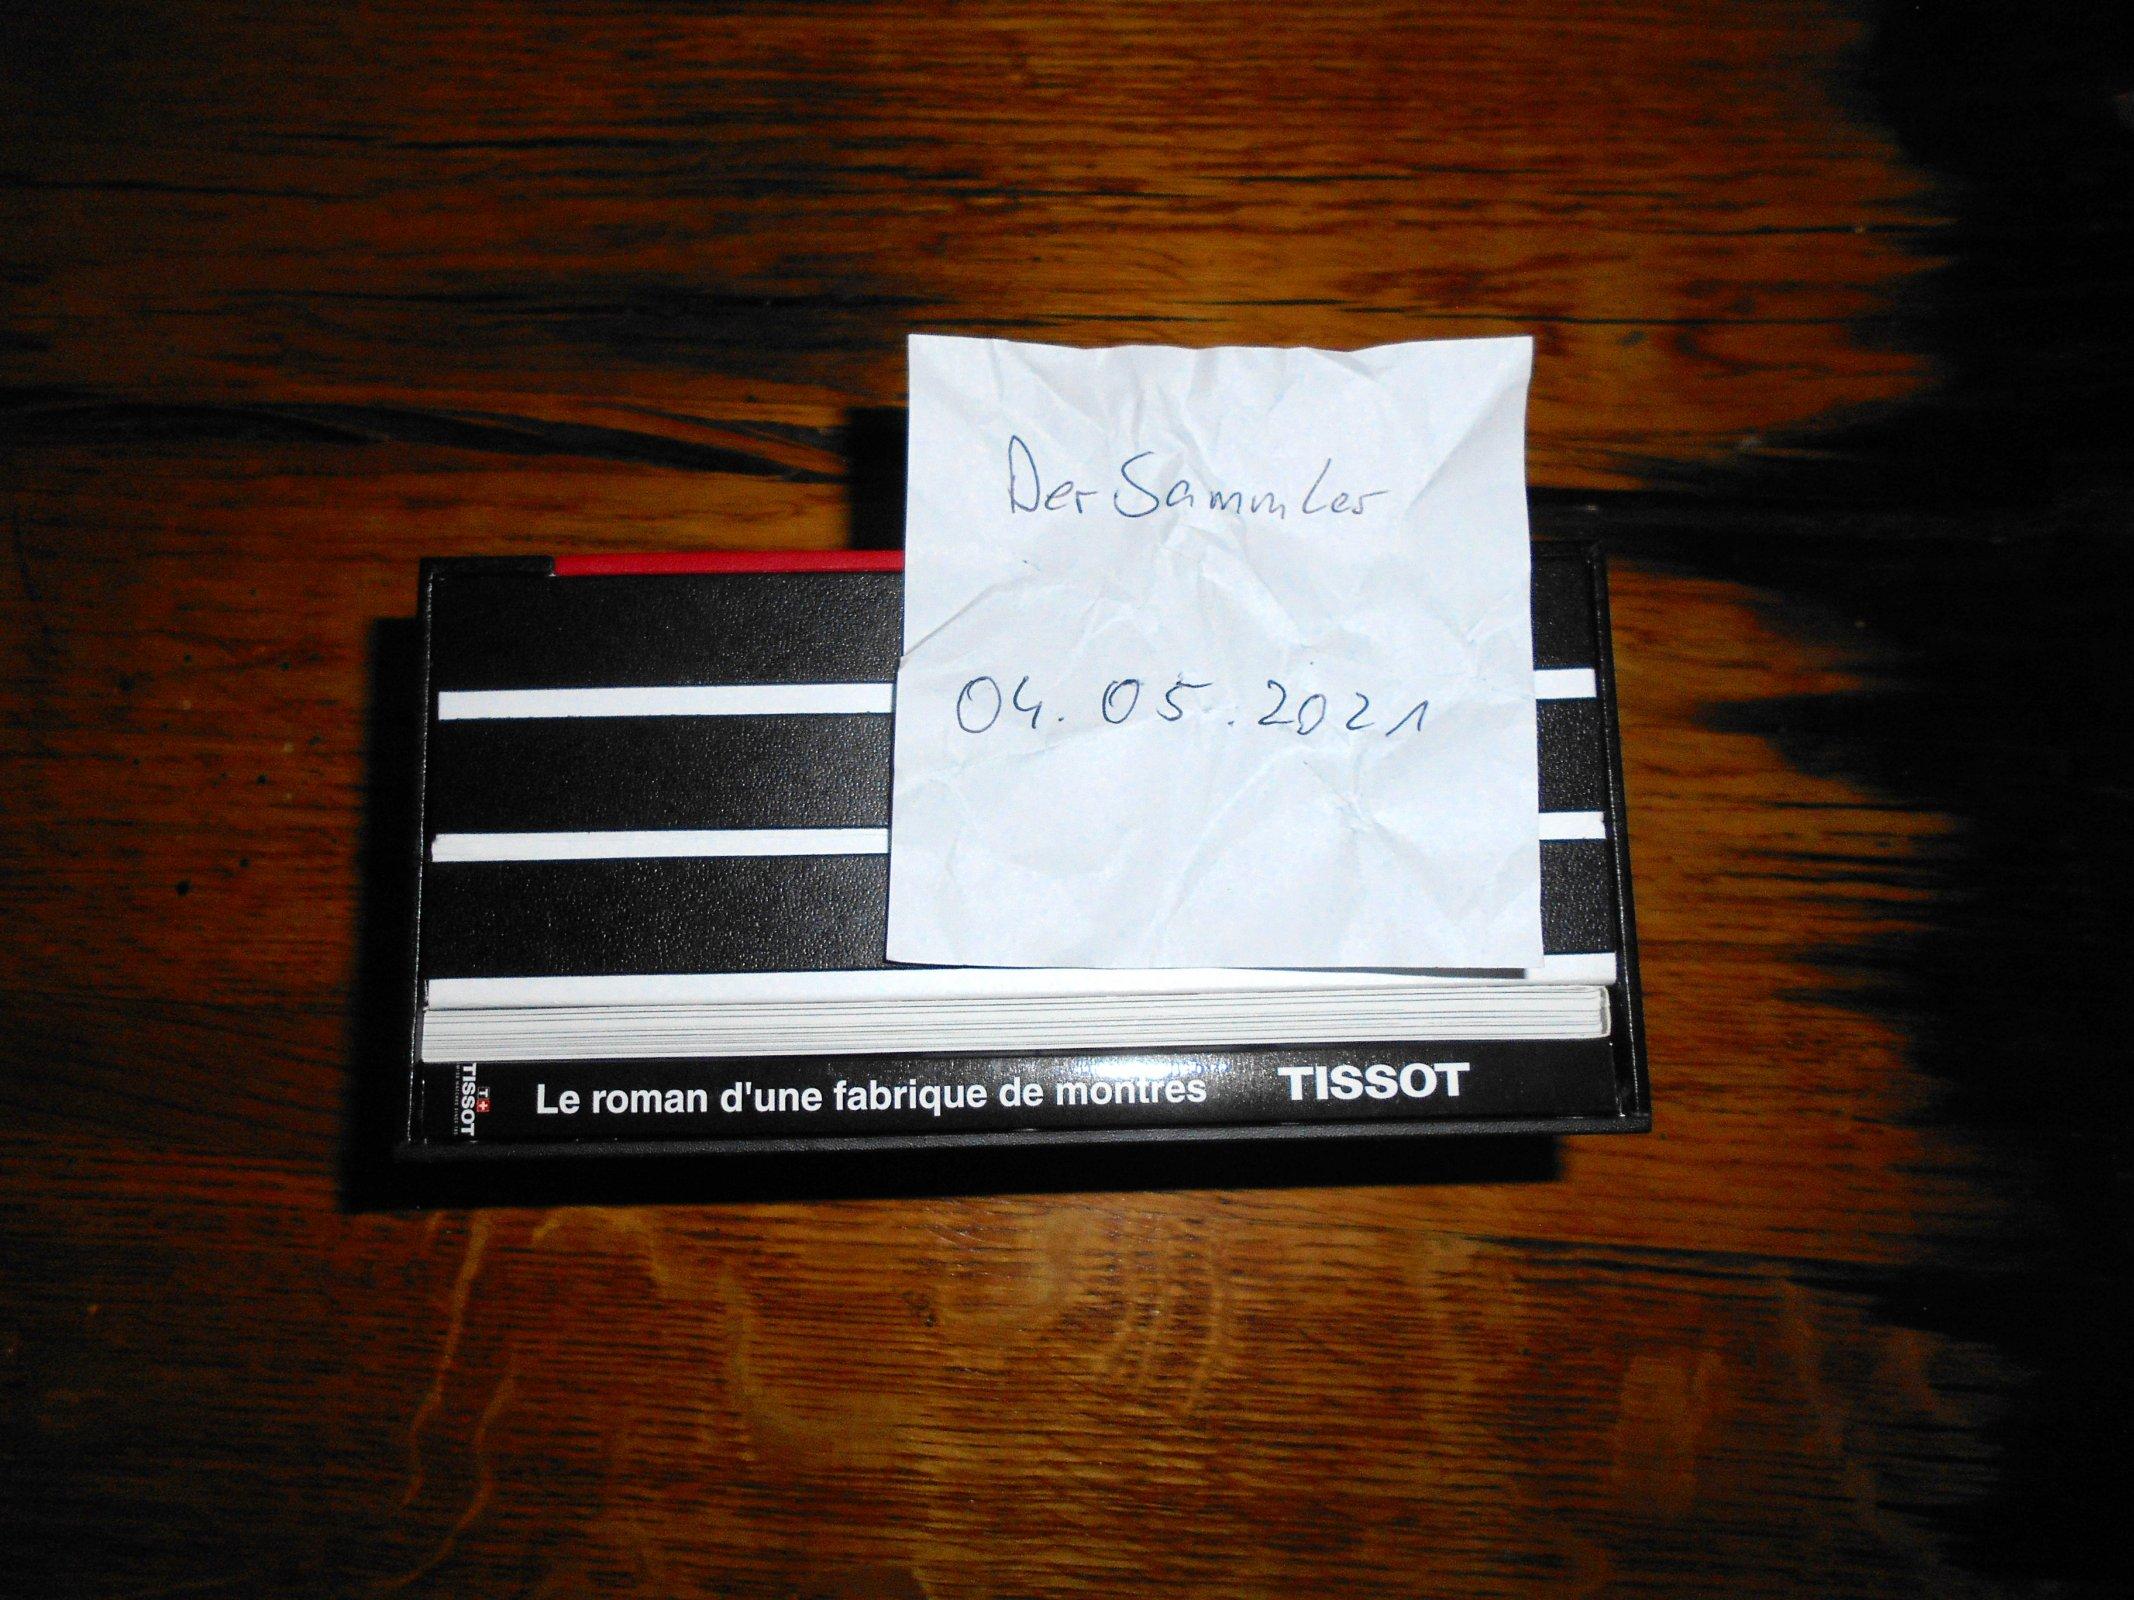 tissot box fr 2.JPG